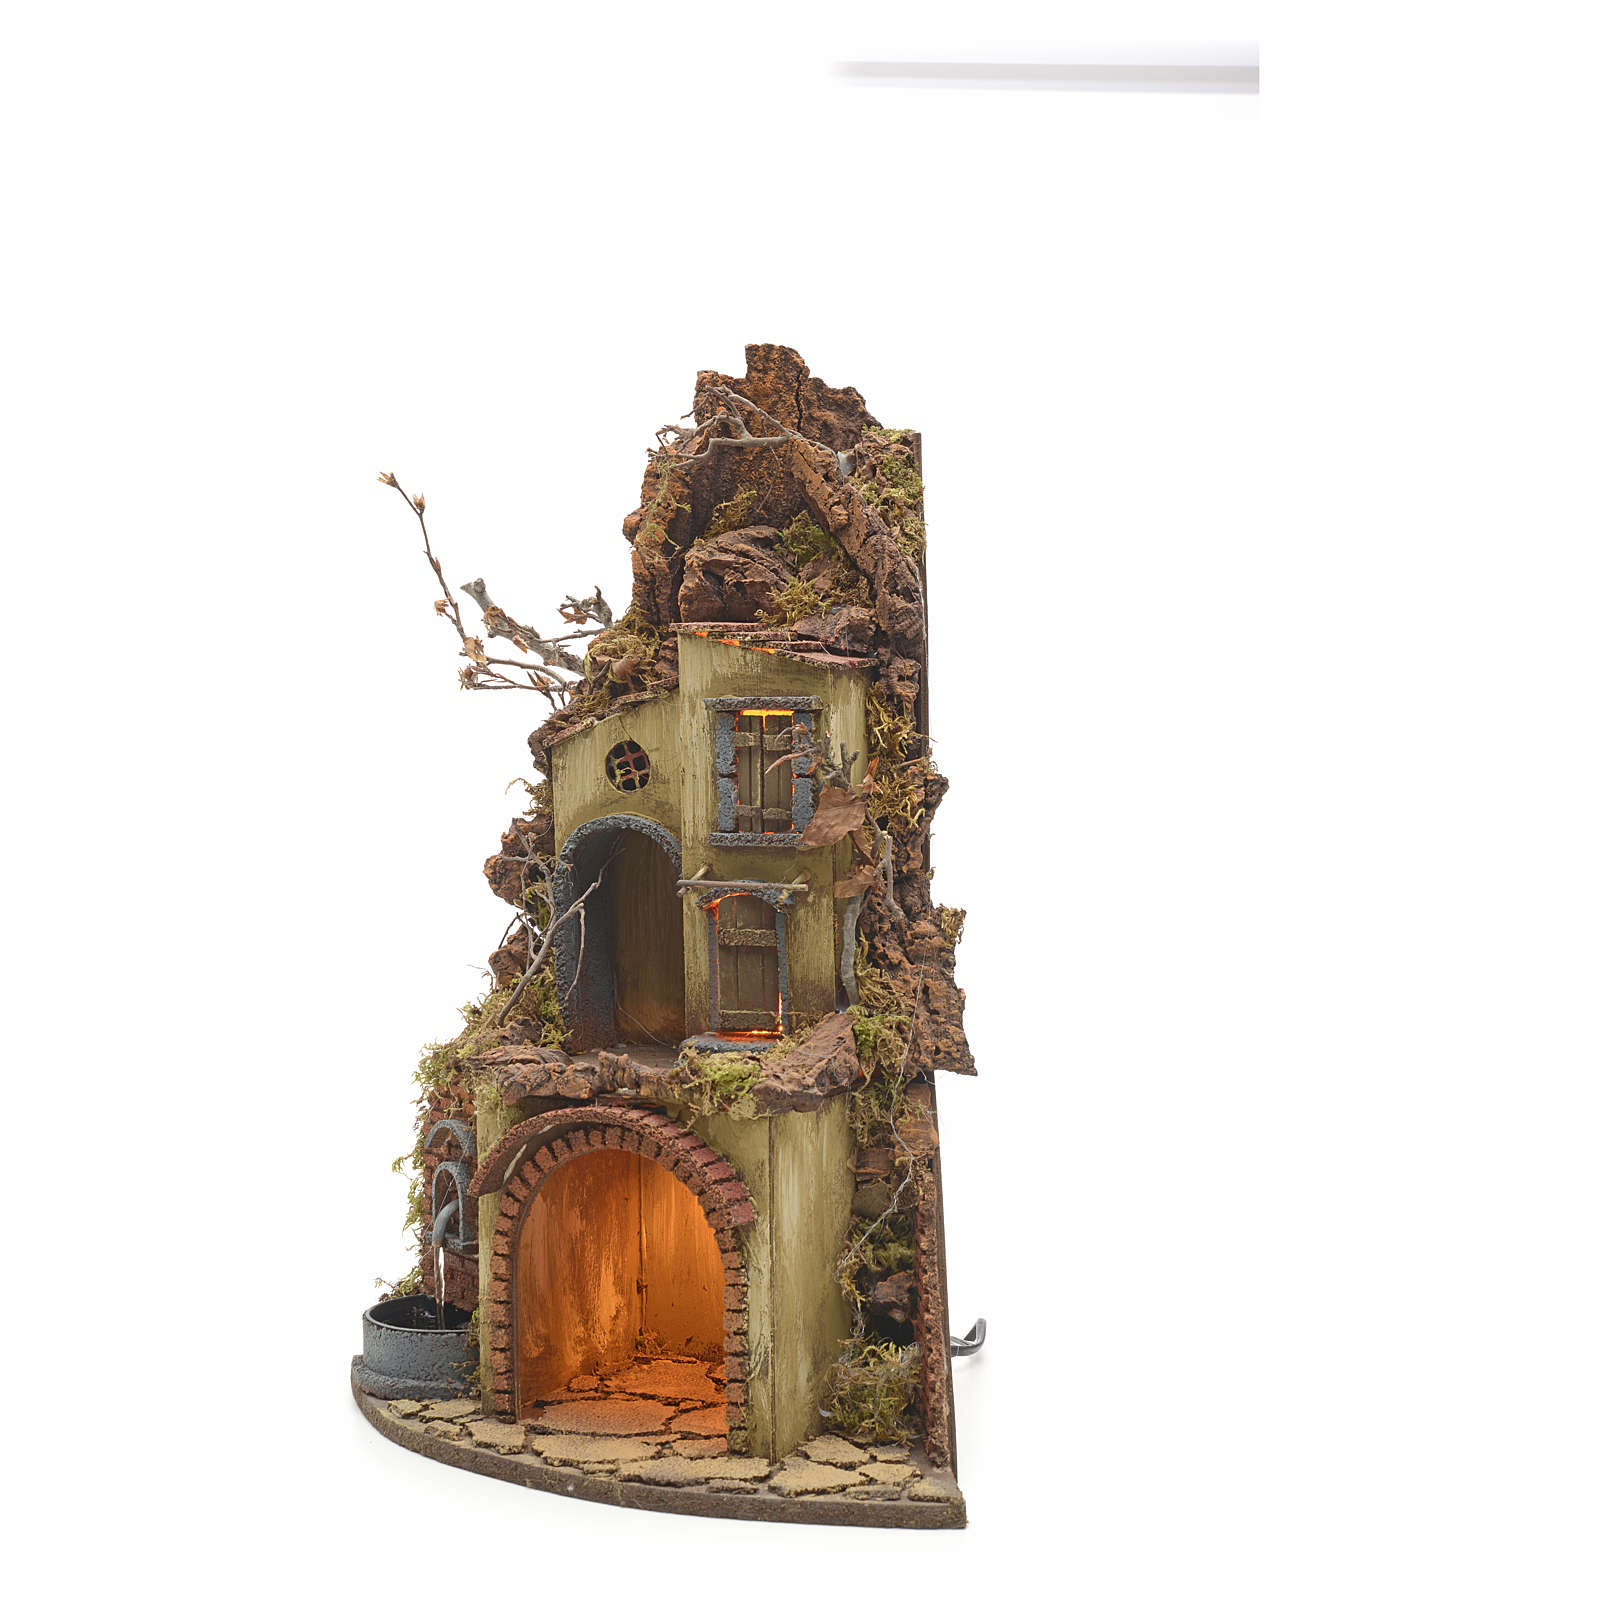 Borgo illuminato angolo e fontana presepe napoletano 4